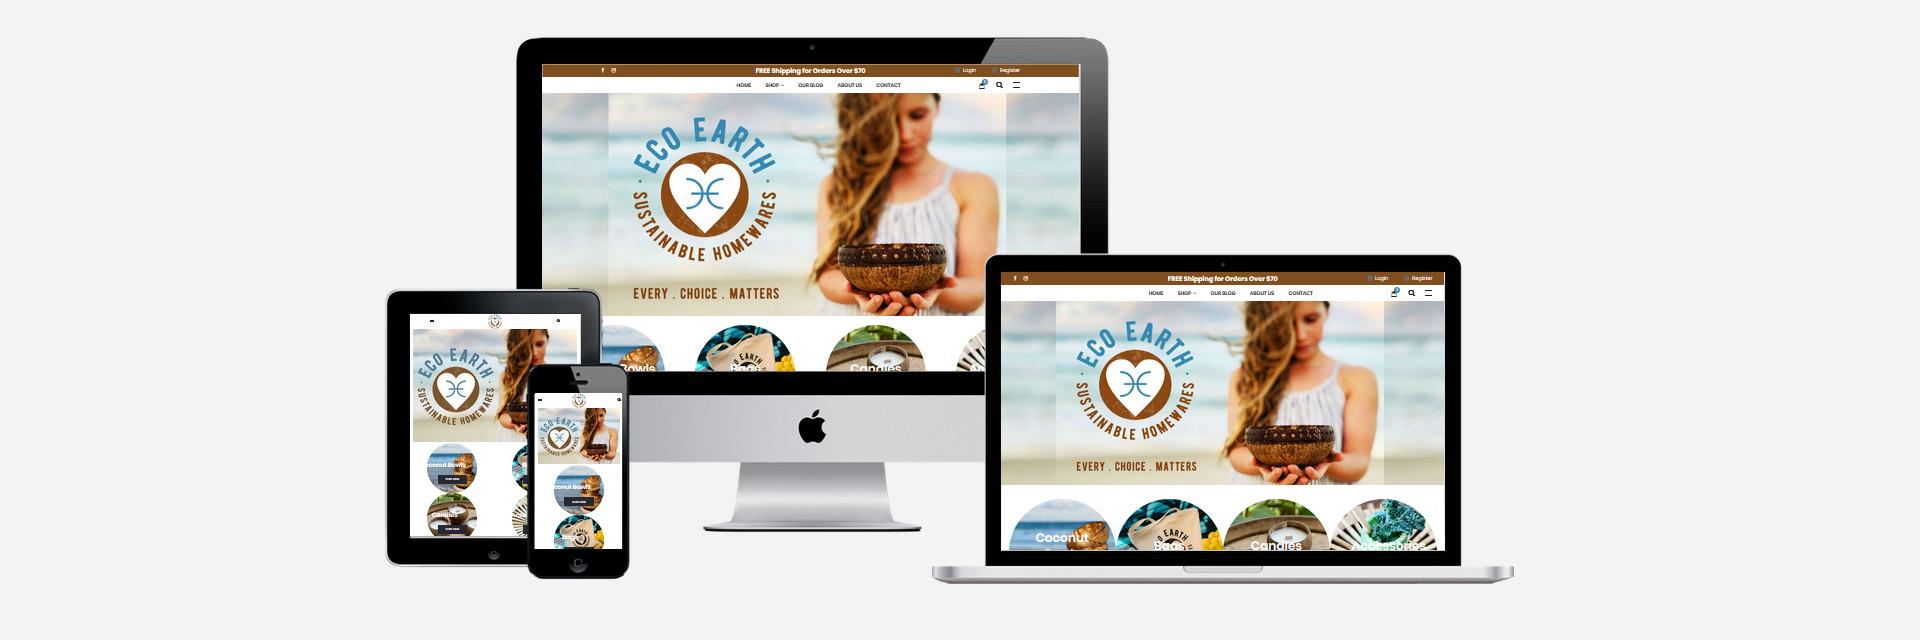 Eco Earth Homewares - New Website Design